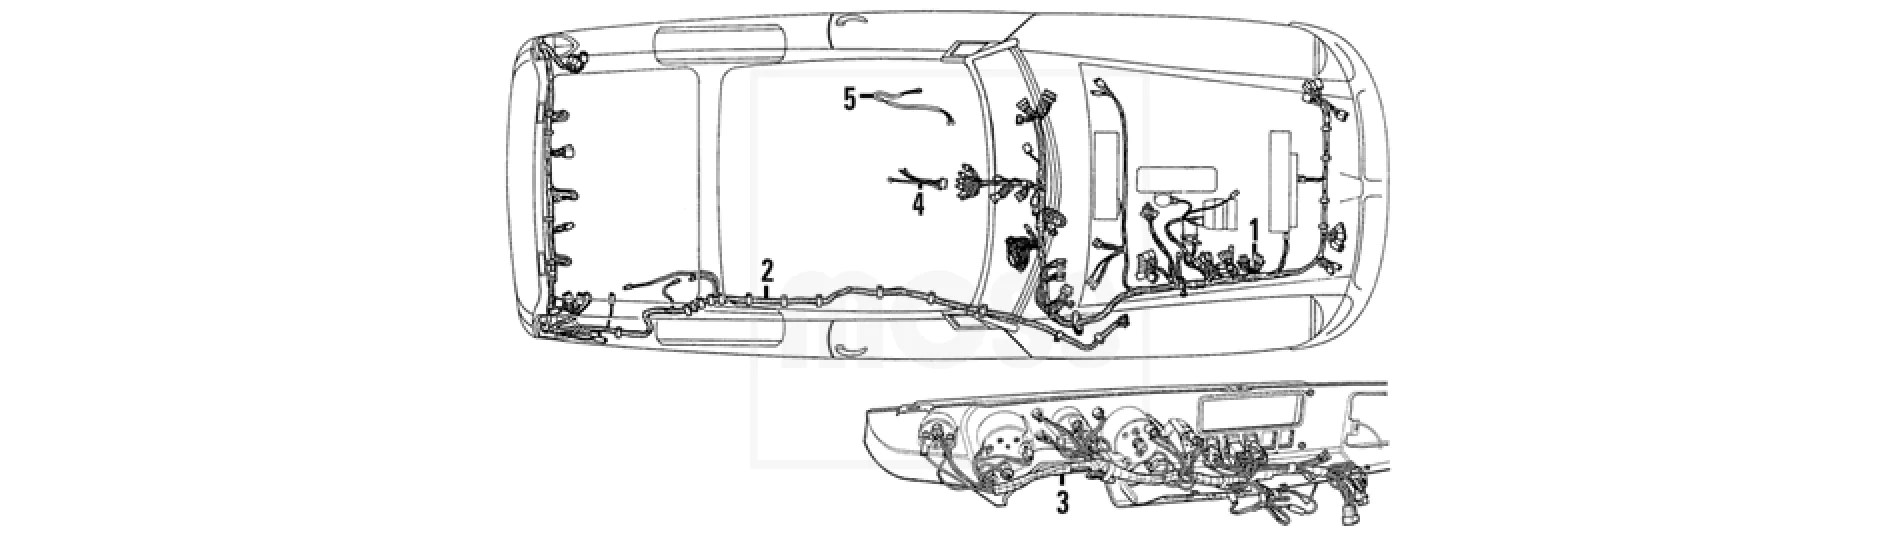 mgb wiring harness wiring diagram expert on 1976 midget wiring diagram 1976 triumph  [ 1900 x 538 Pixel ]